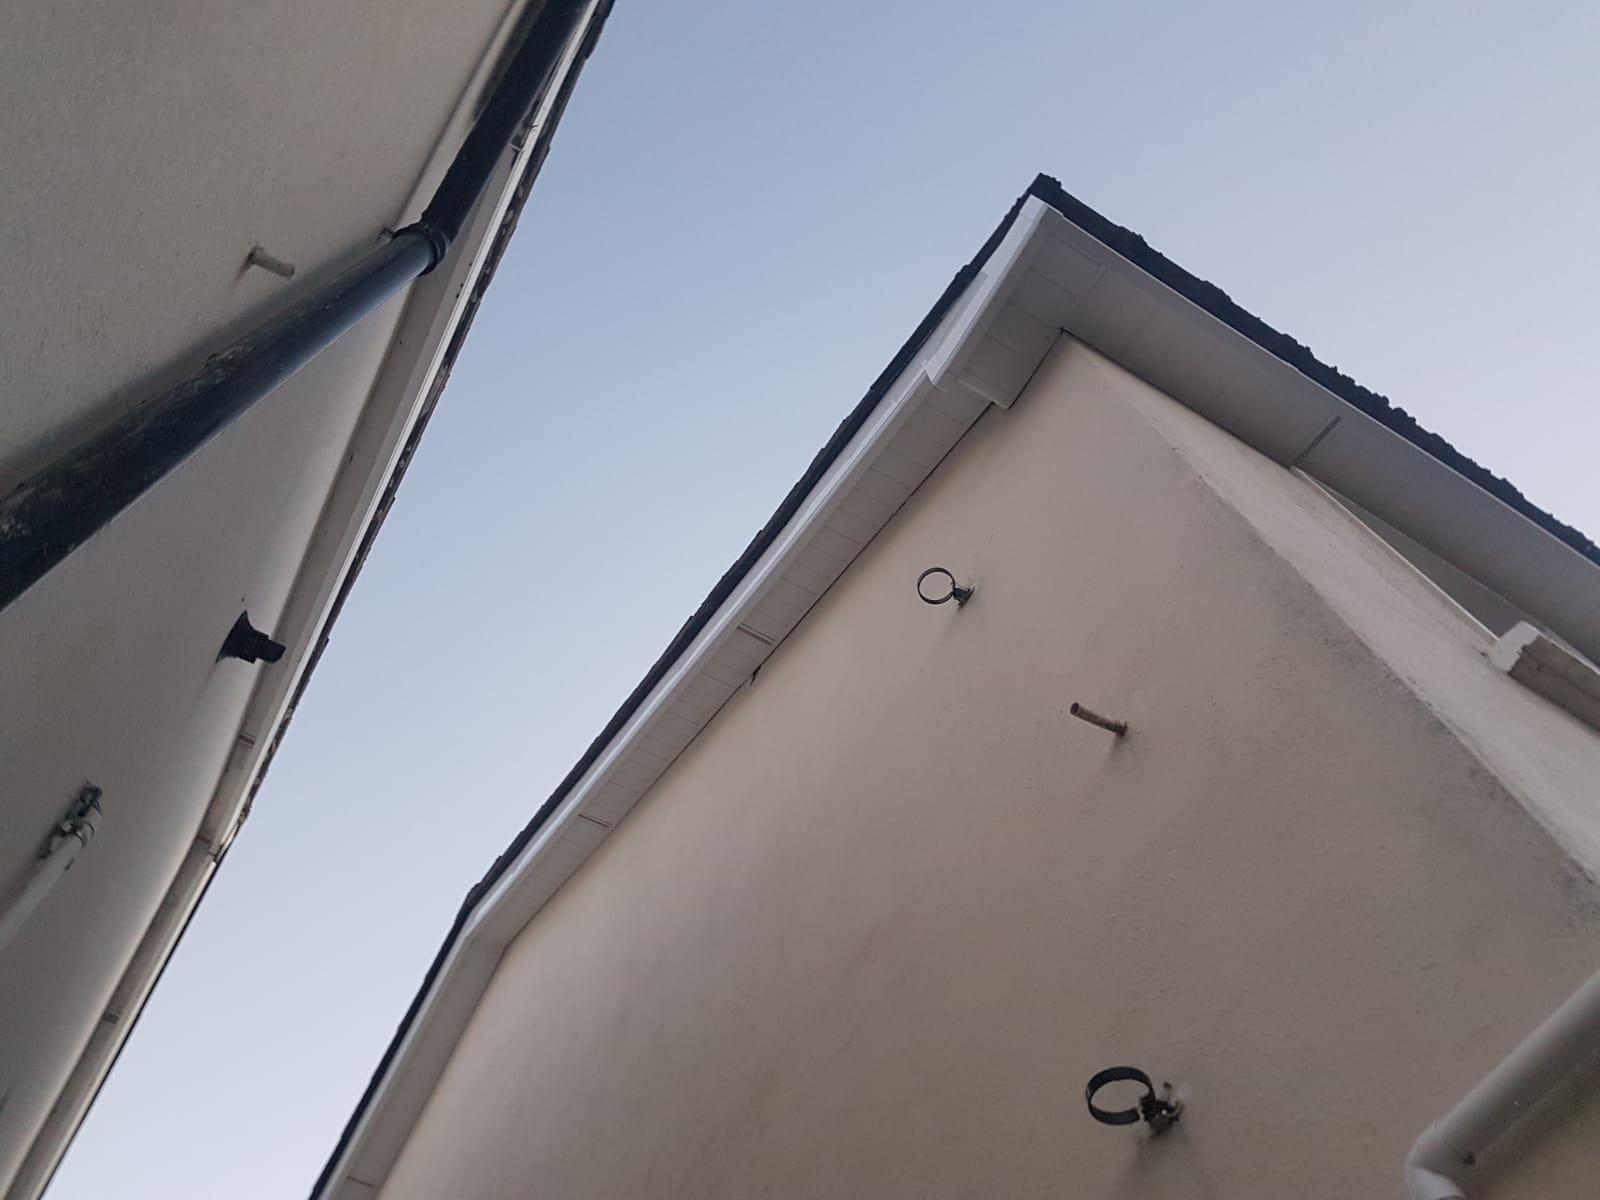 Gutter Repairs in Moone, Co. Kildare